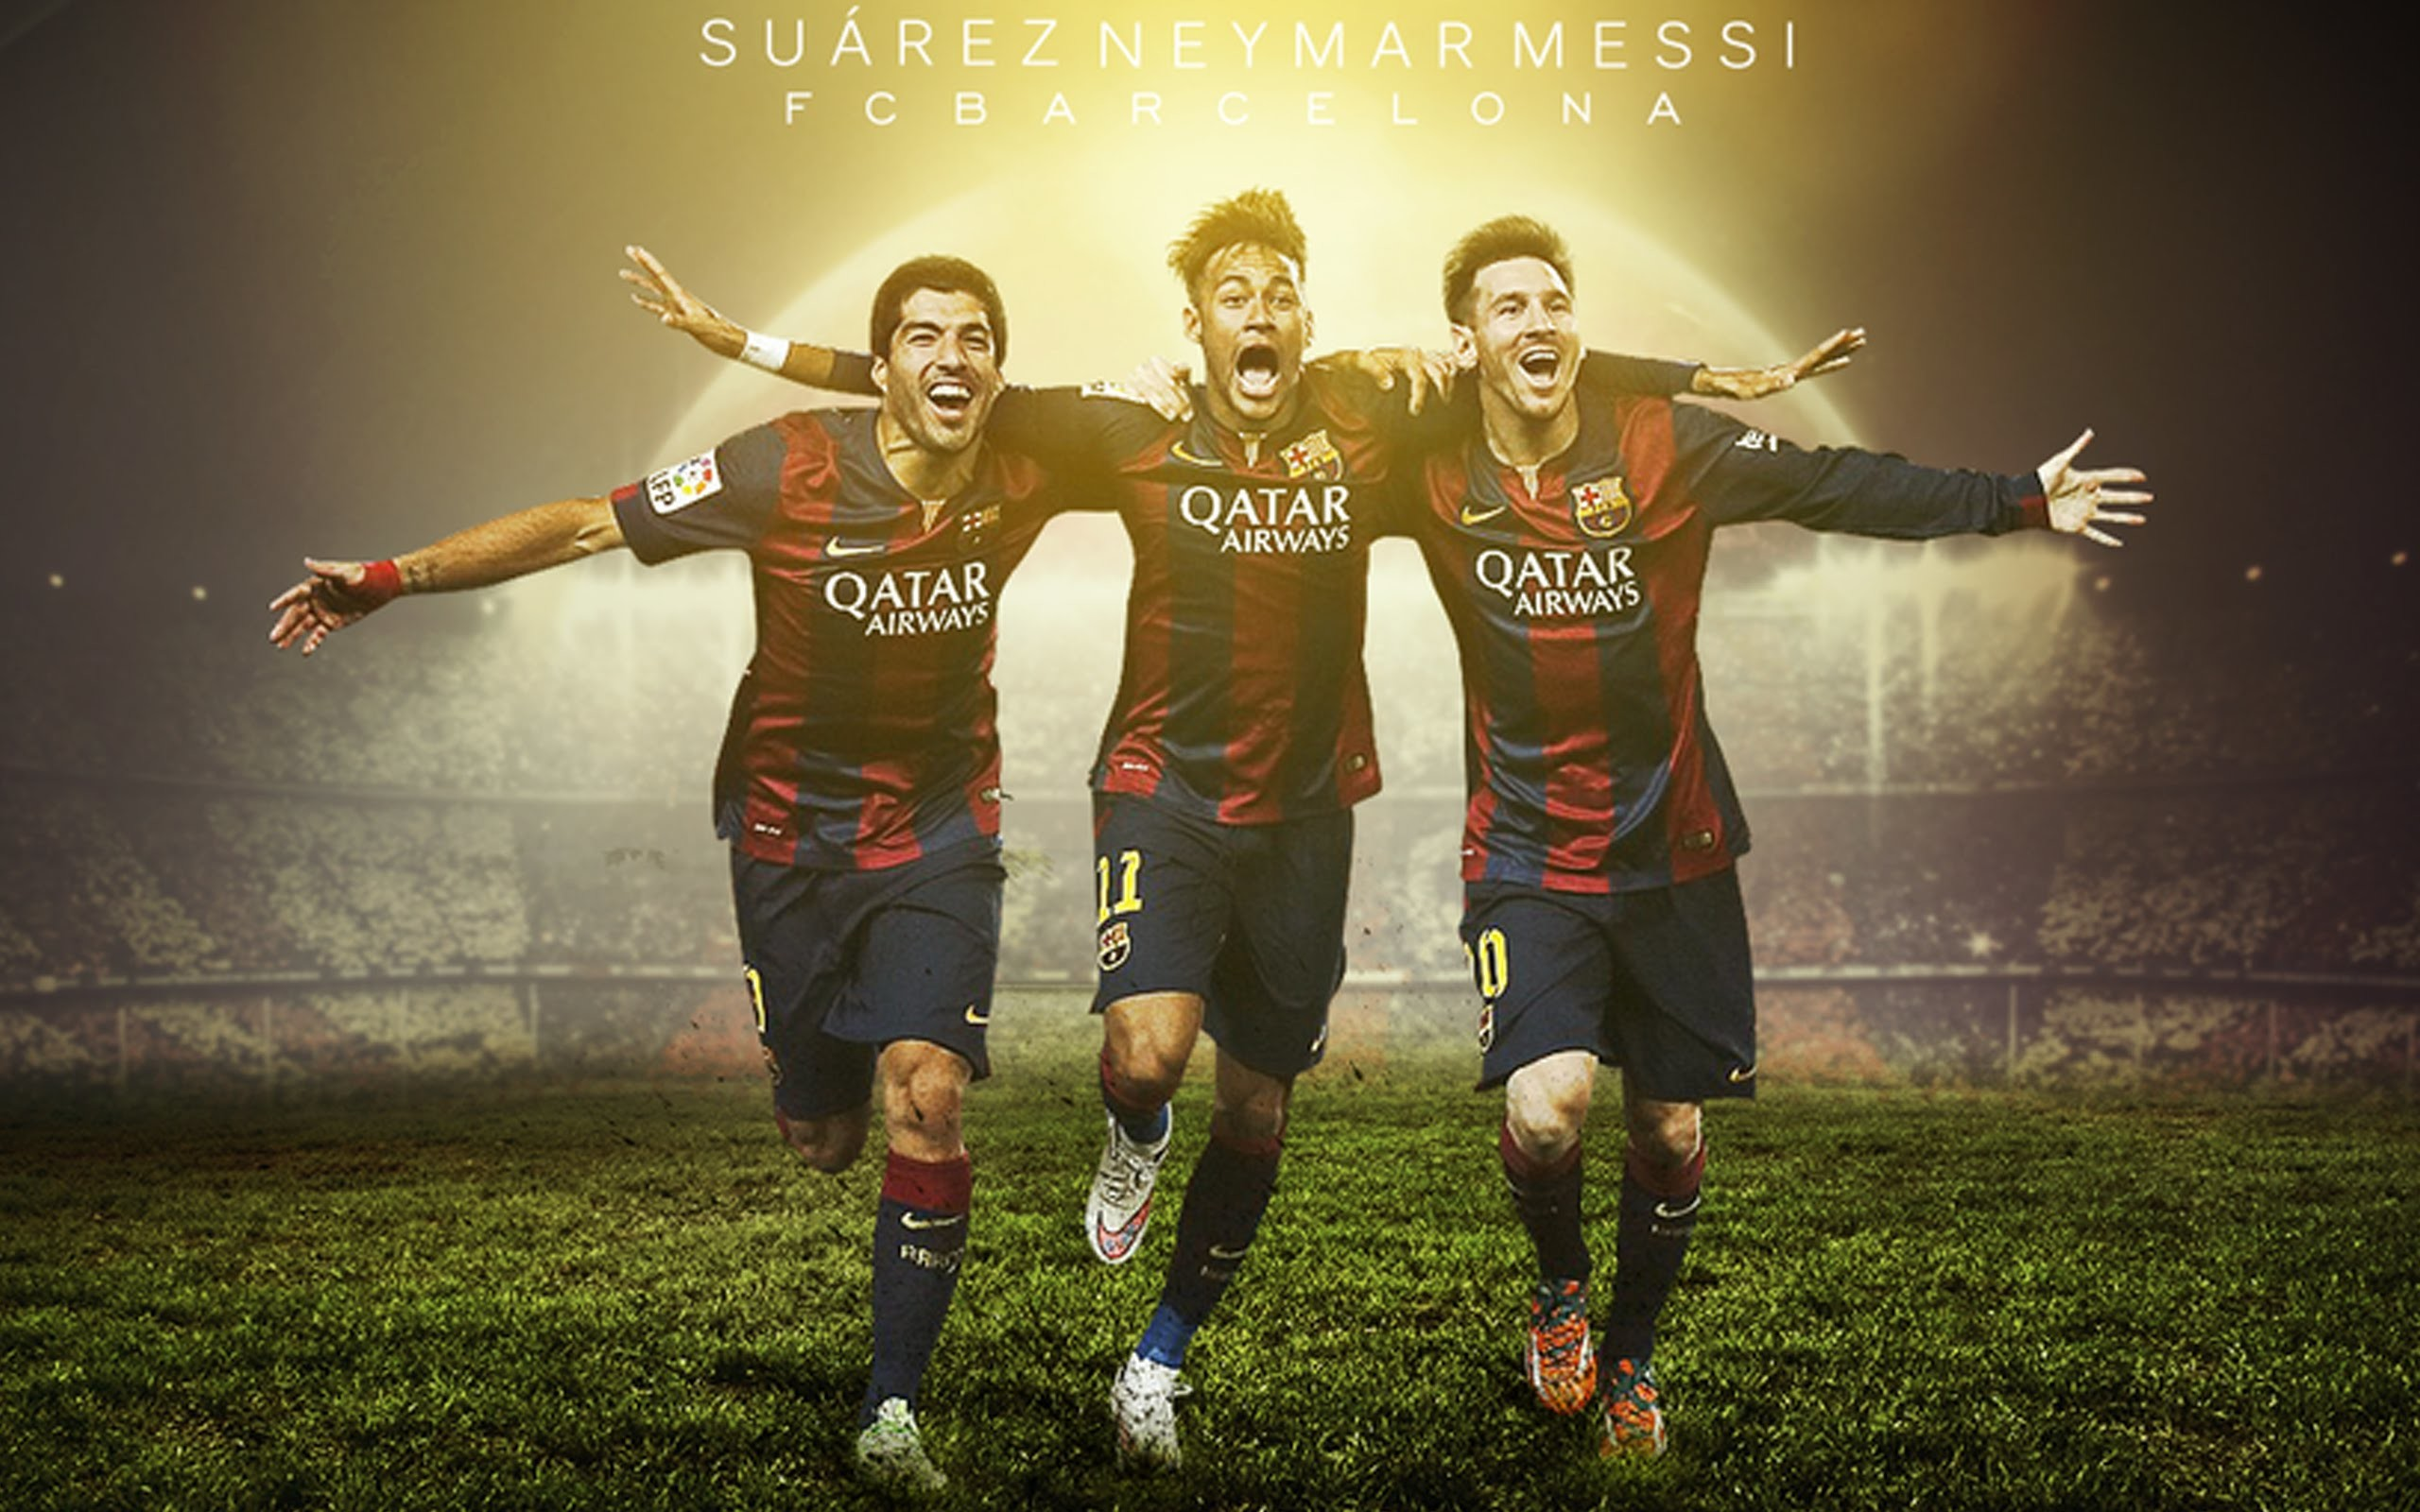 Suarez Neymar Messi Wallpaper. Suarez Neymar Messi Wallpaper – Team FC  Barcelona